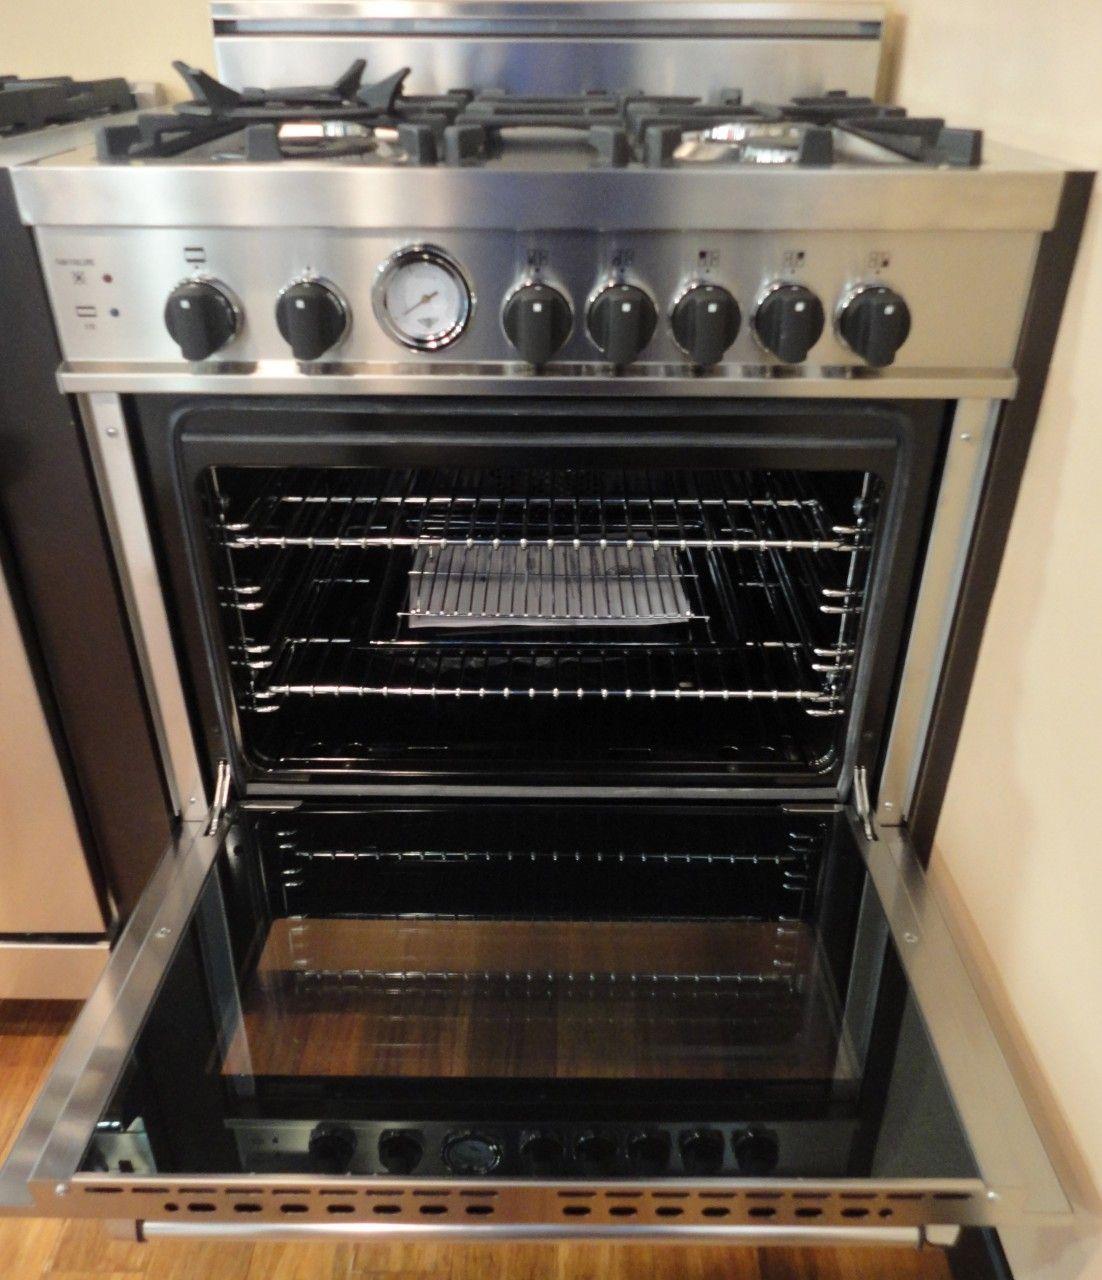 My stove -